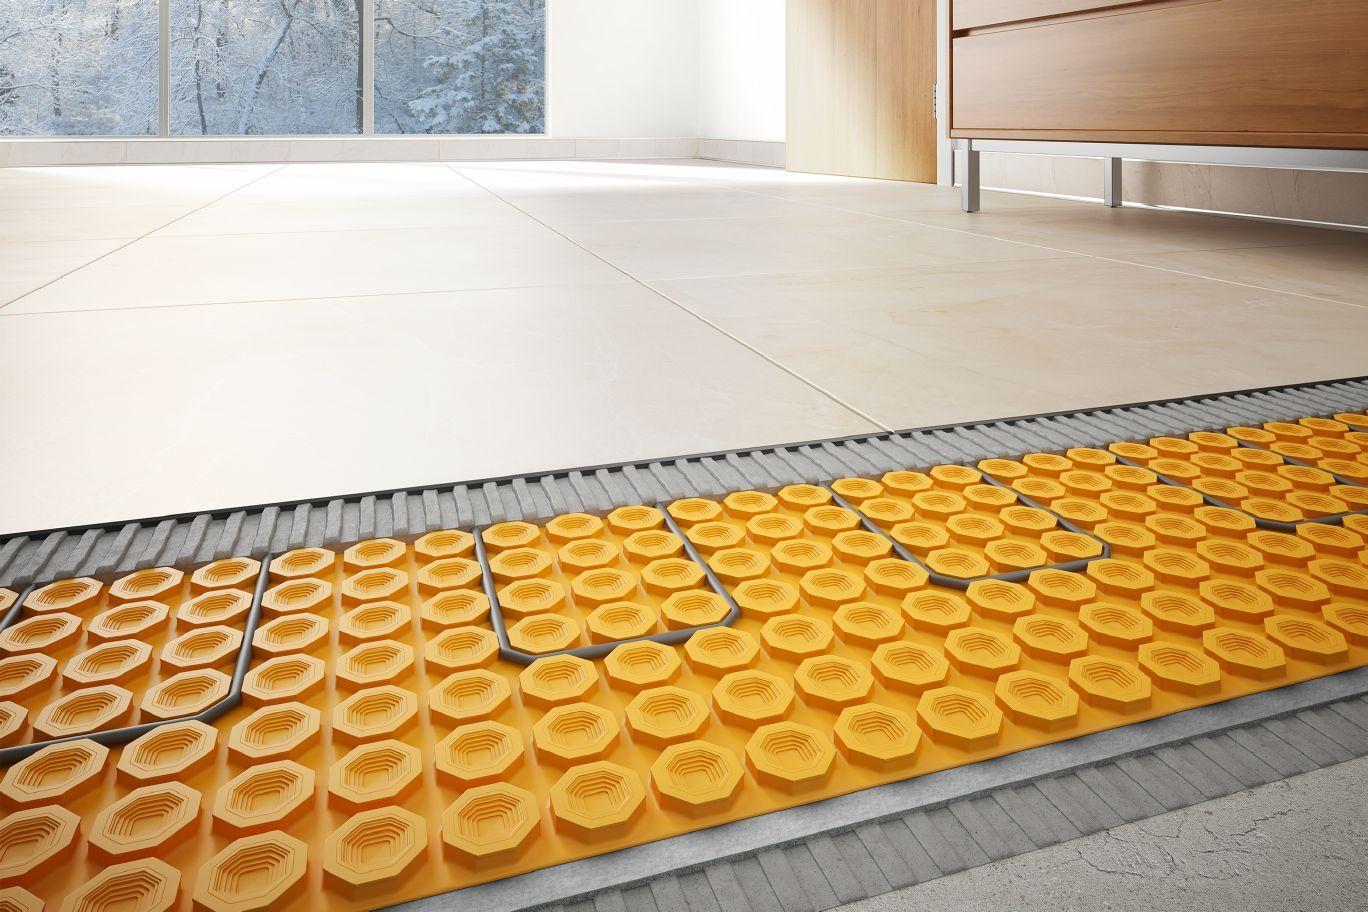 Schluter Ditra Heat Duo Sound Control Thermal Break Compatible W Heating Cables Installing Hardwood Floors Flooring Installing Tile Floor